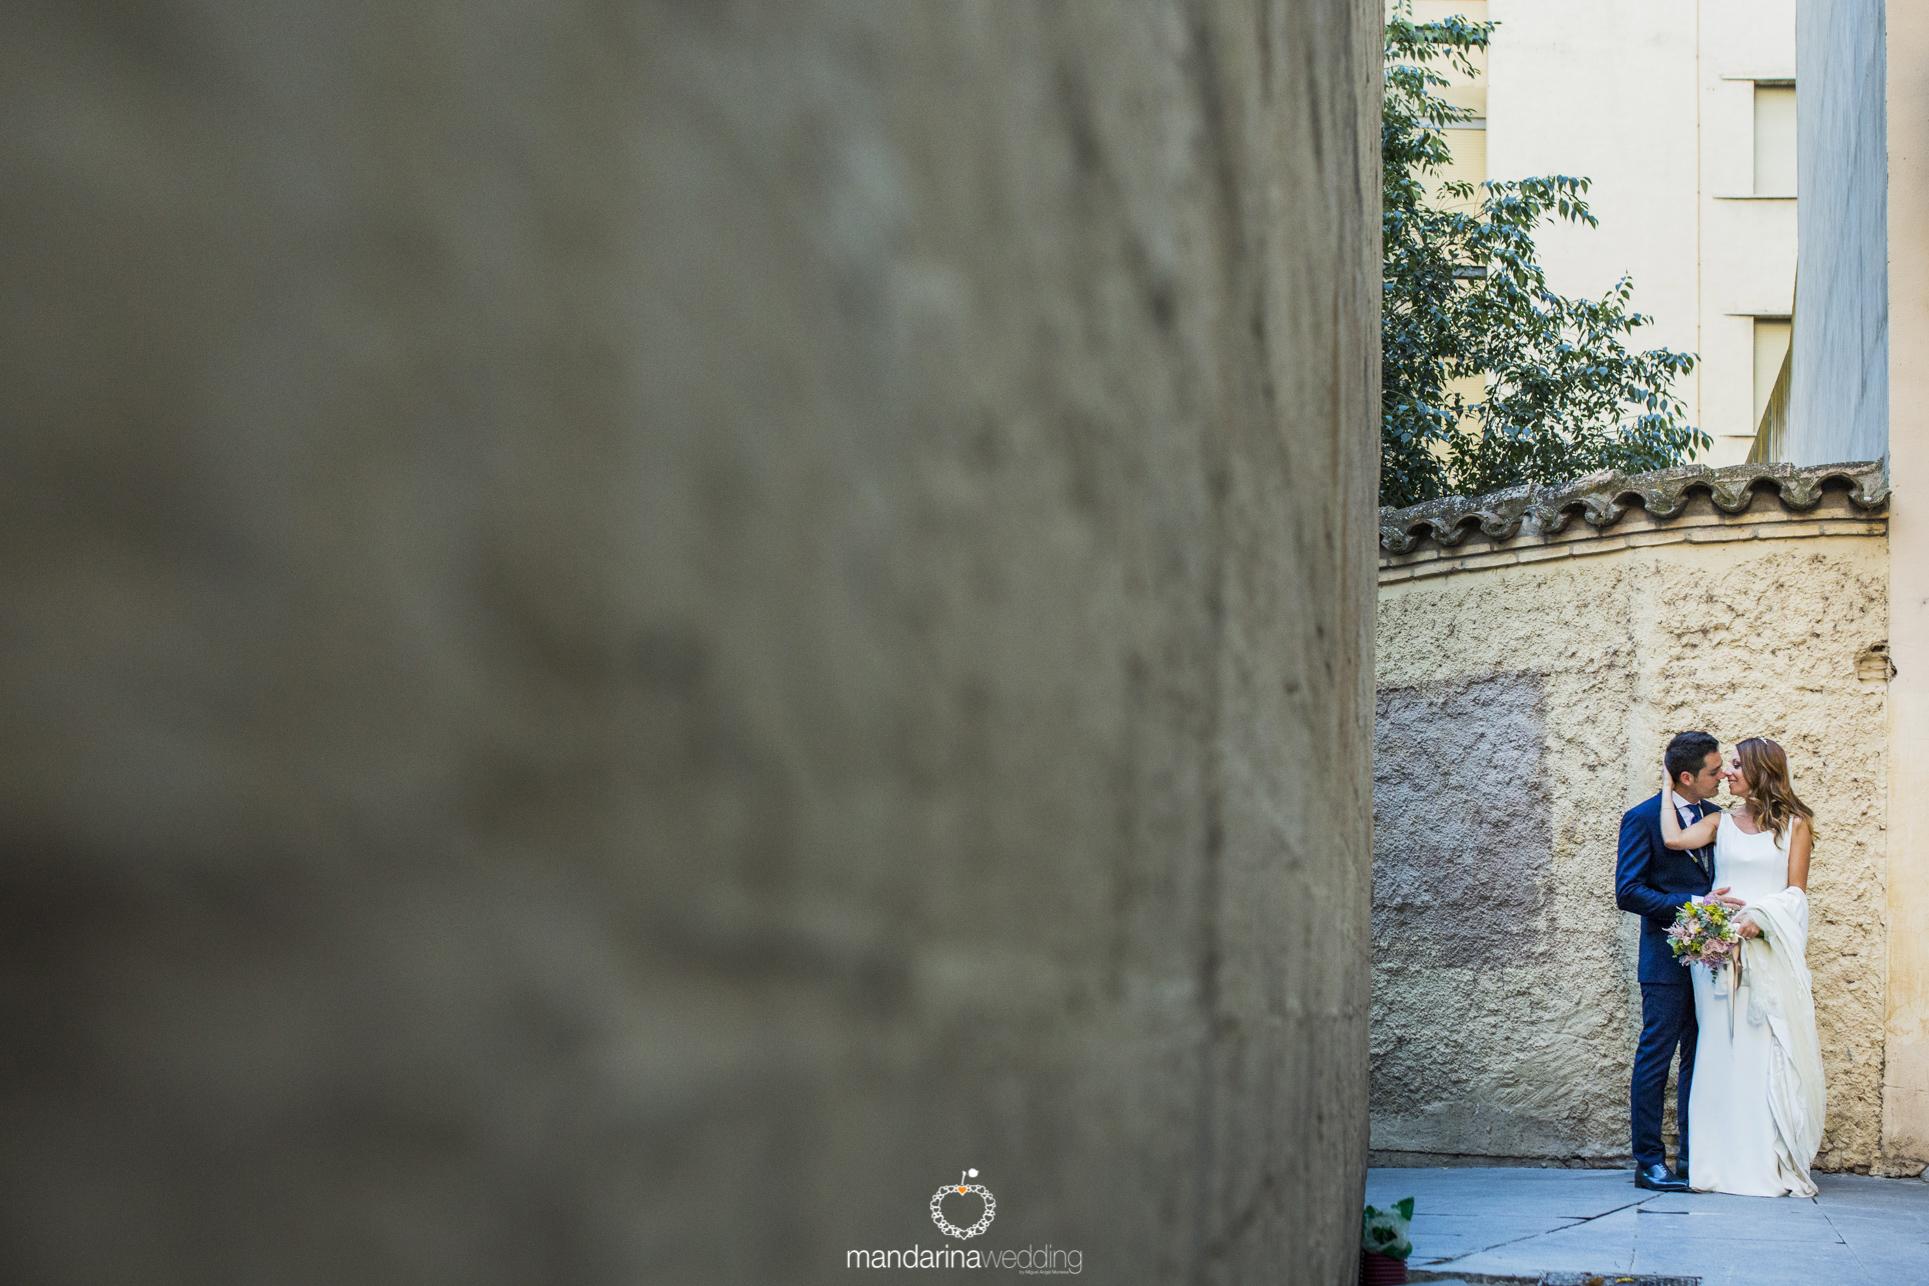 mandarina wedding, fotografo boda pais vasco, fotografo boda zaragoza, fotógrafo boda soria, fotografo boda Madrid, fotógrafo boda tarragona-03